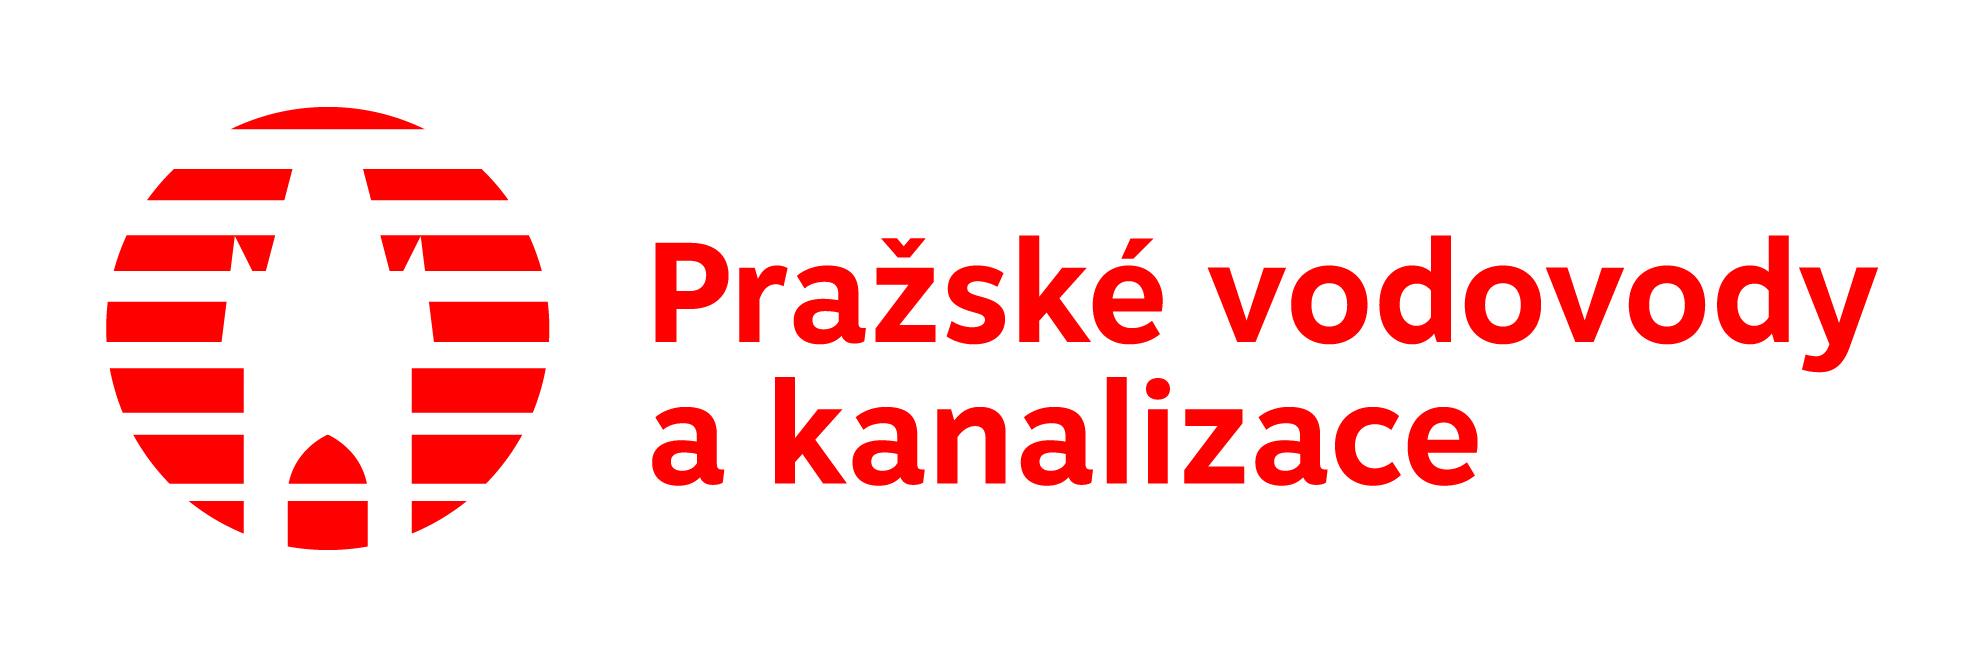 dopravni-omezeni-klikata-bude-od-pondeli-23-brezna-2020-uzavrena